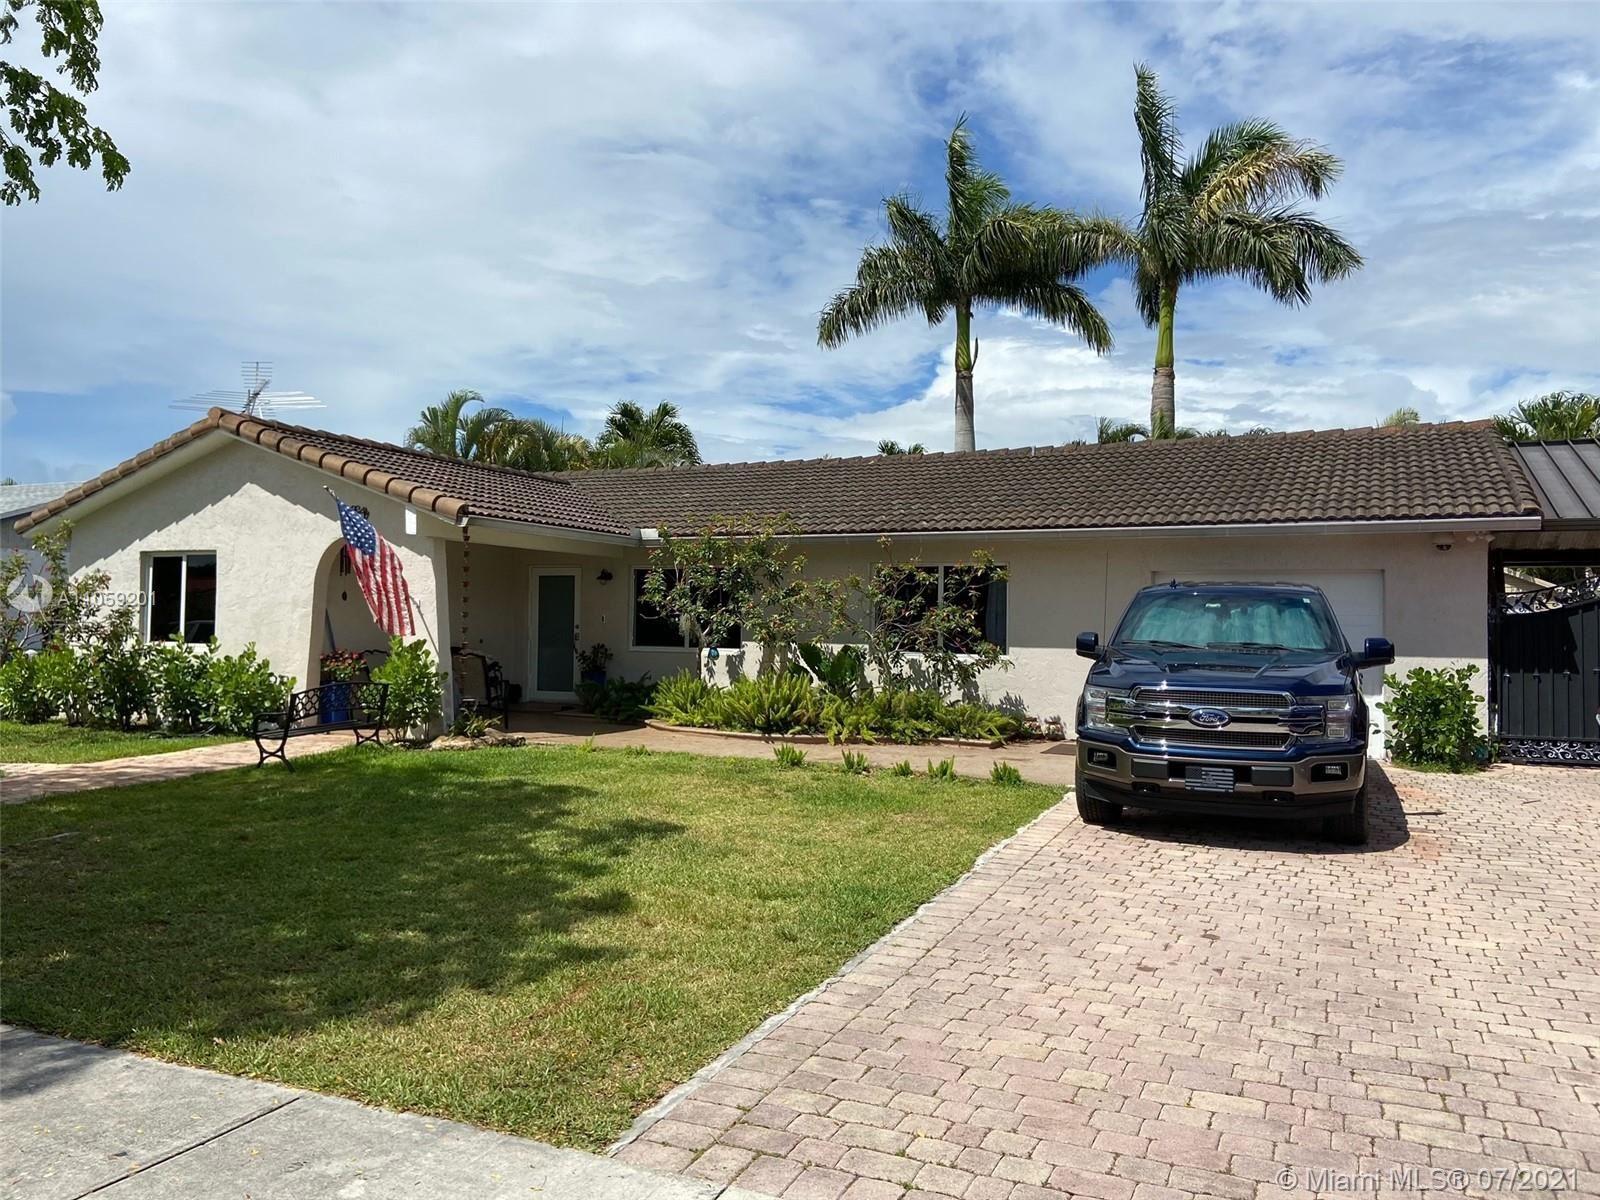 6544 SW 148 PL, Miami, FL 33193 - #: A11059201